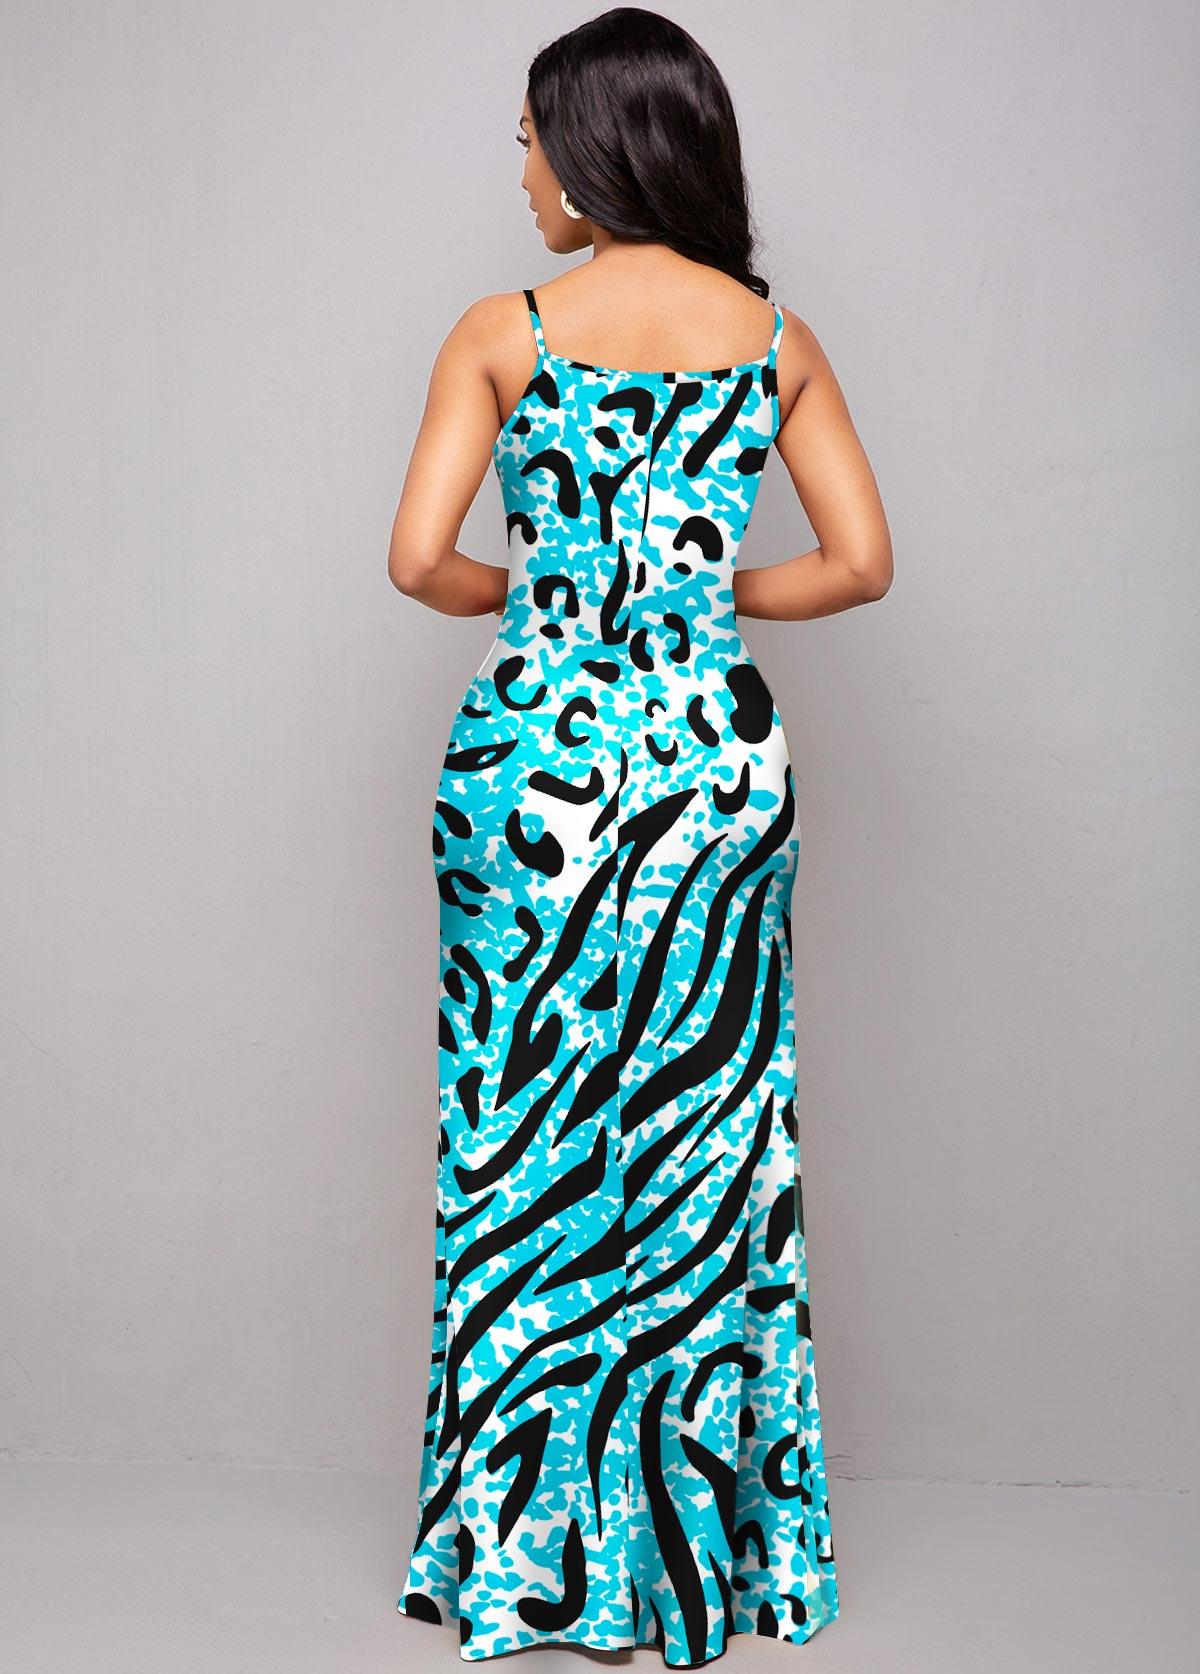 Animal Prints Spaghetti Strap Maxi Dress